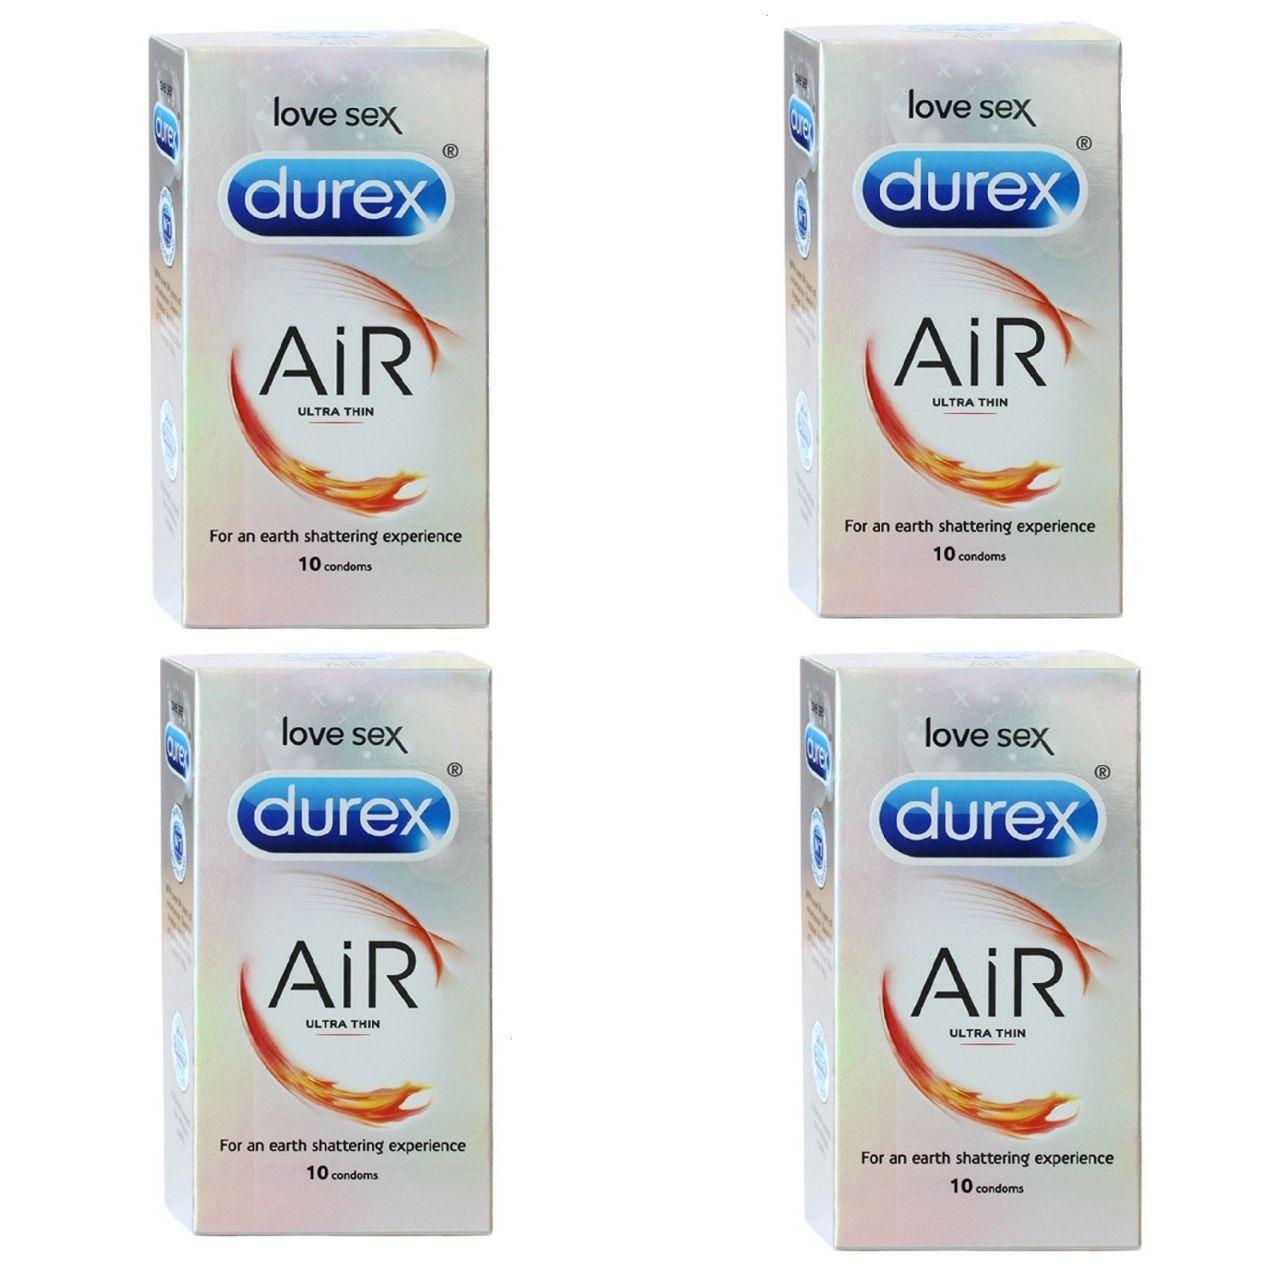 Durex Air Condoms 40 Pcs Thinnest Condoms Ever Made By Durex Price Comparison